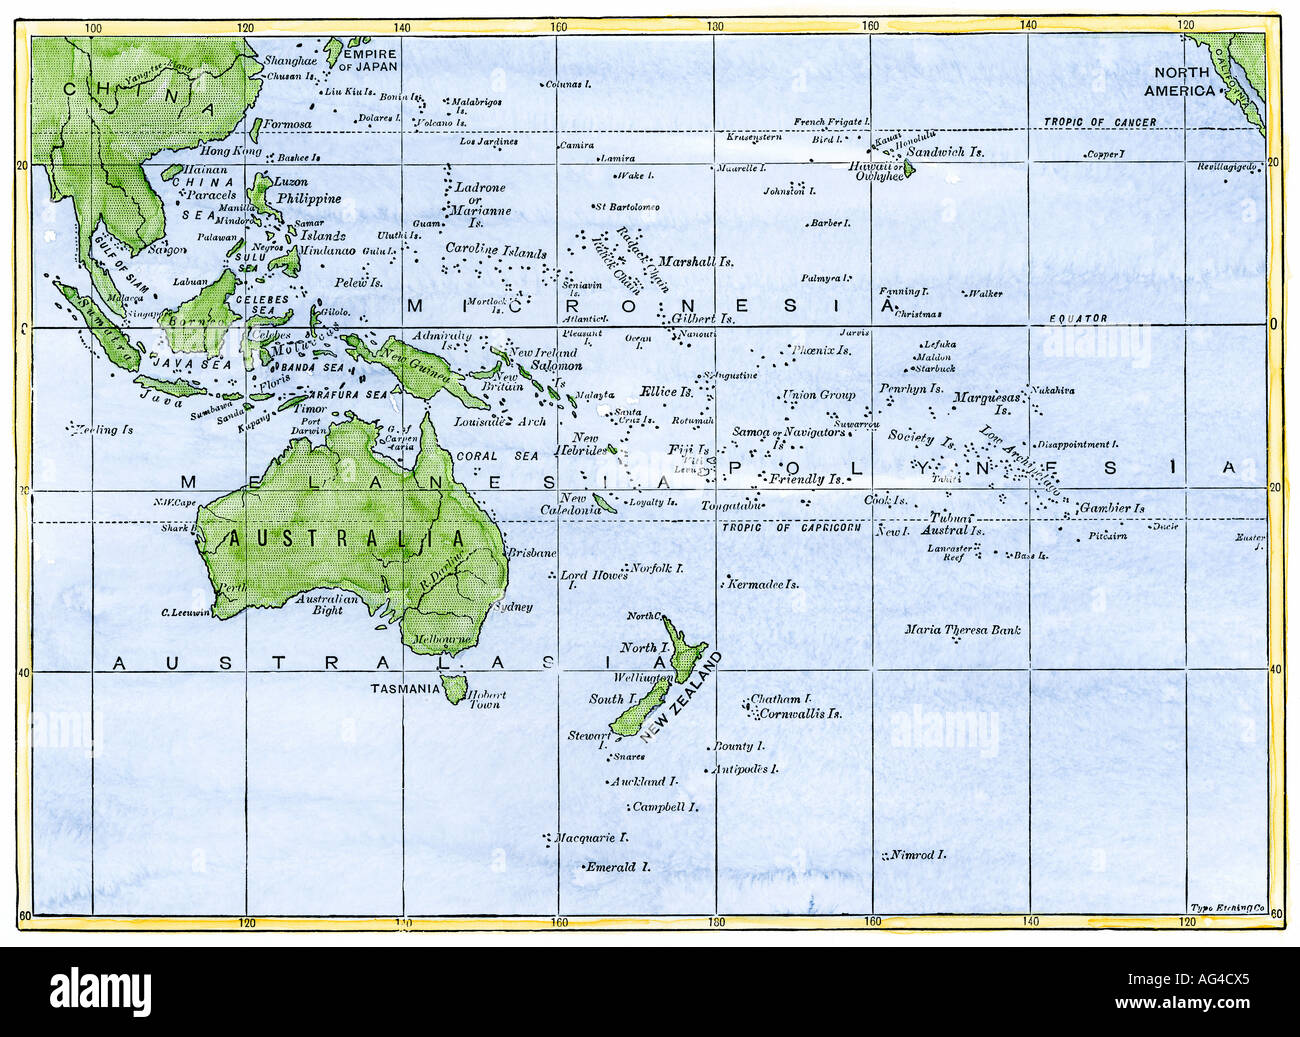 South Pacific Ocean Map Stock Photos & South Pacific Ocean Map Stock ...